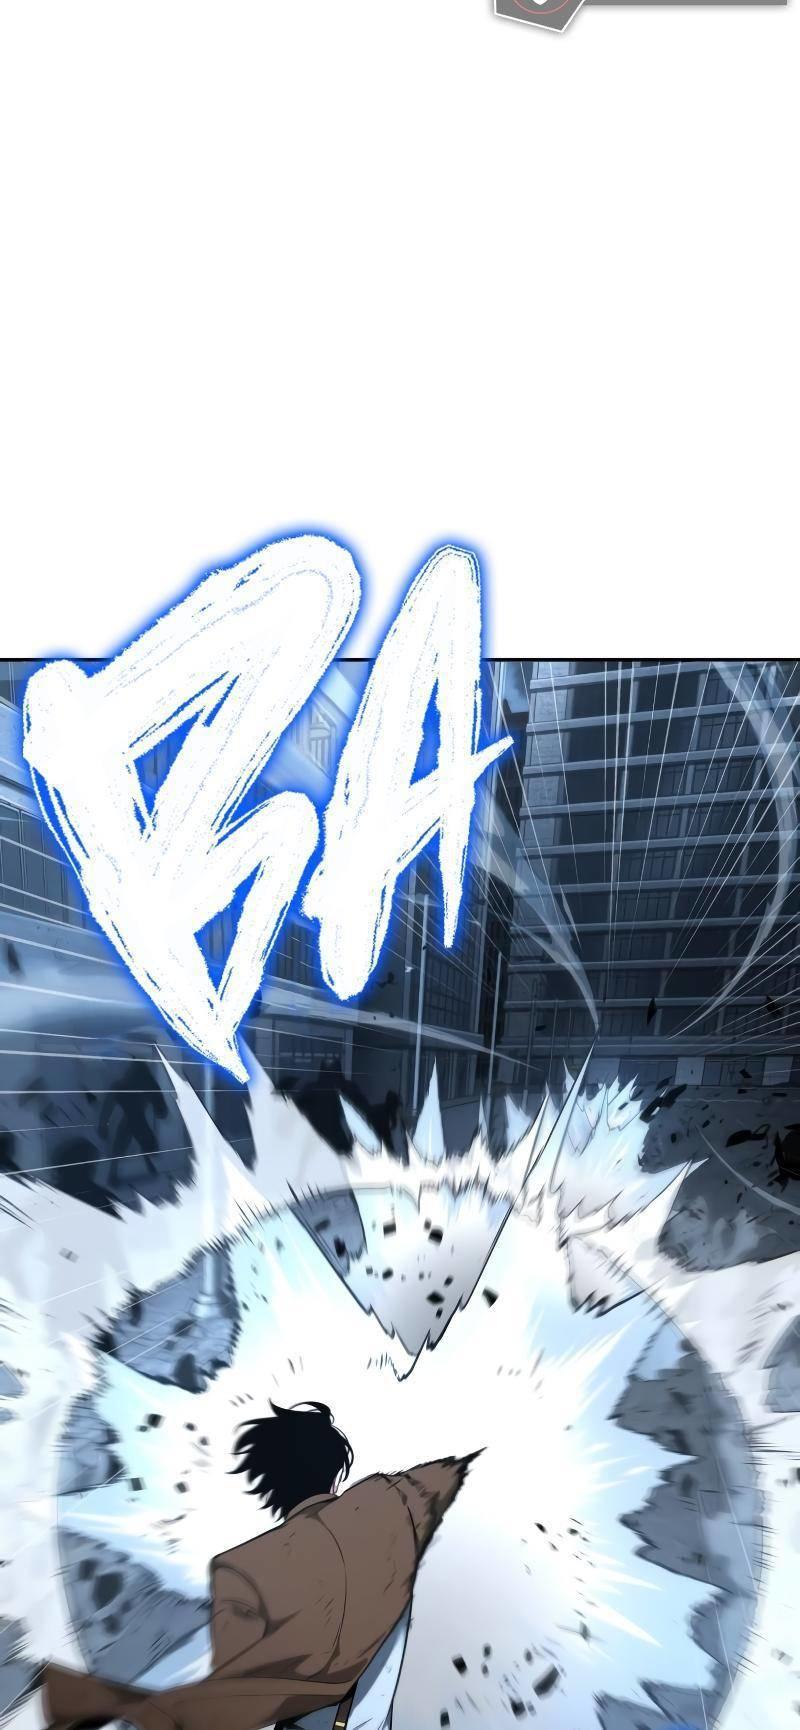 Omniscient Reader'S Viewpoint Chapter 72 page 44 - Mangakakalot